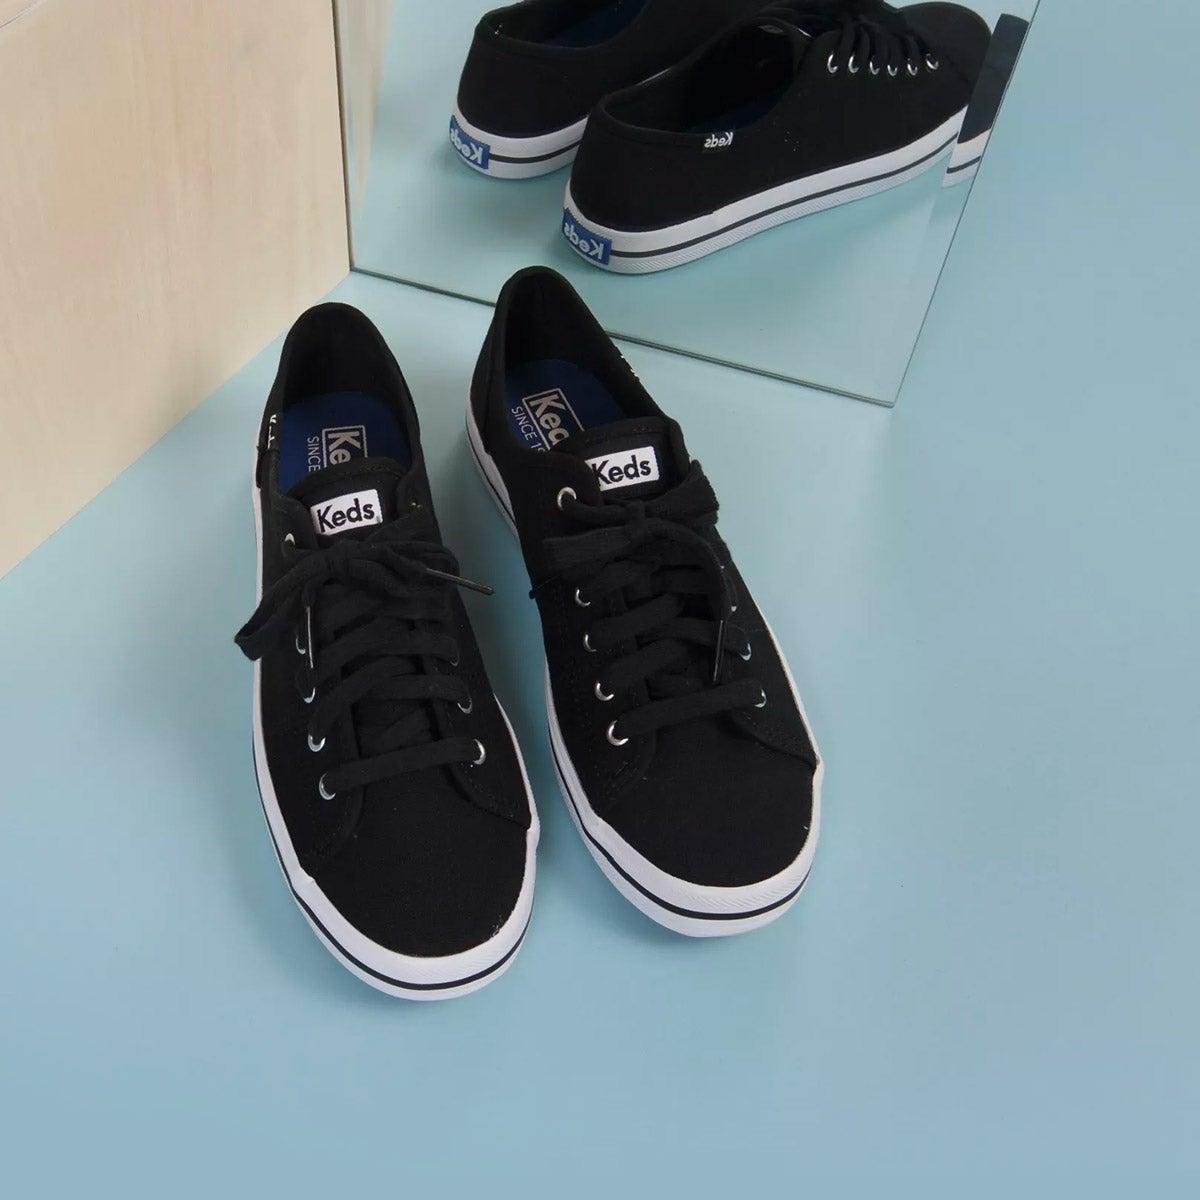 Lds Kickstart black CVO canvas sneaker